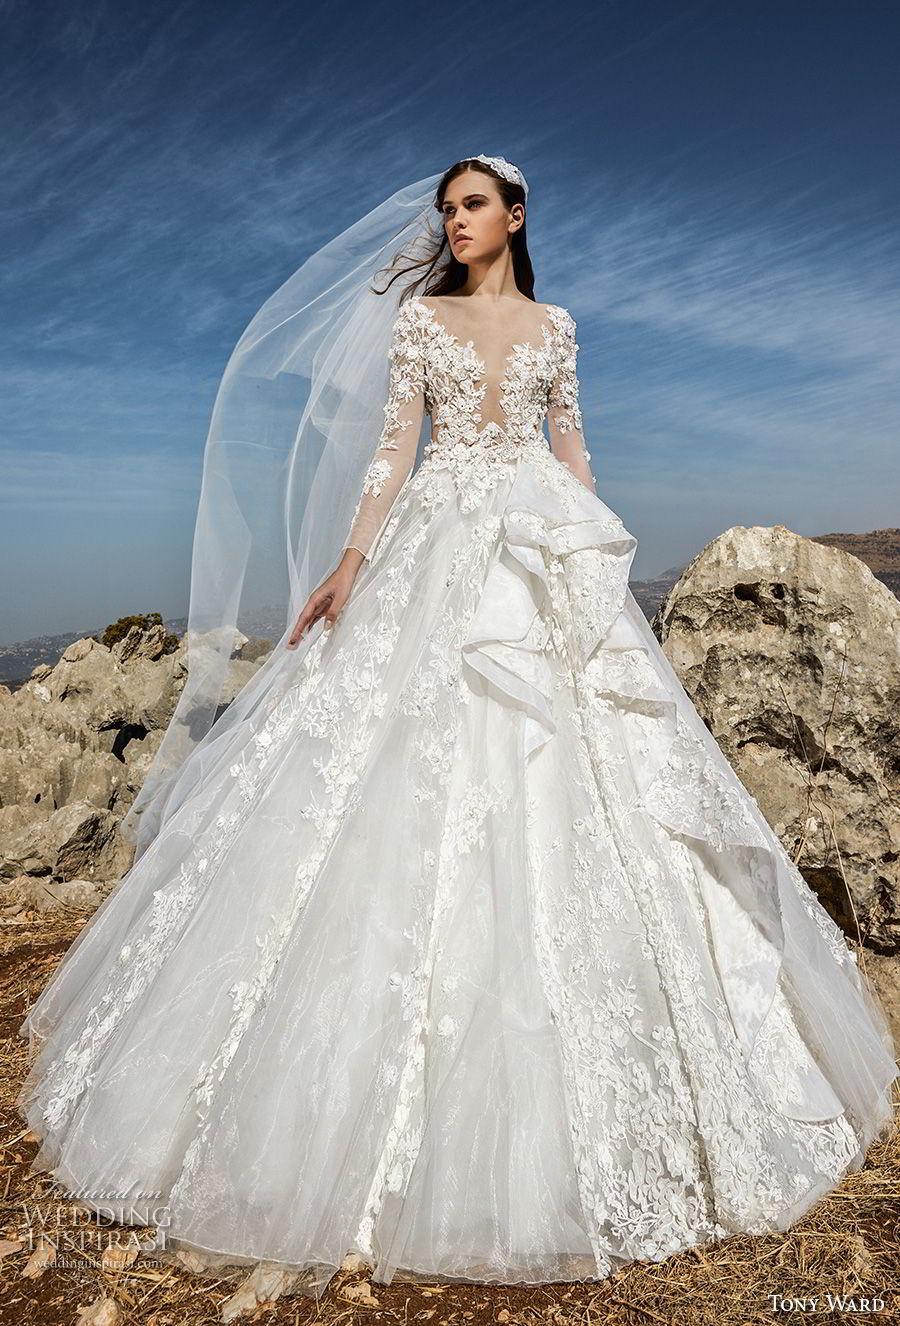 tony ward fall 2018 bridal long sleeves illusion bateau deep plunging sweetheart neckline heavily embellished bodice princess ball gown a line wedding dress (1) mv